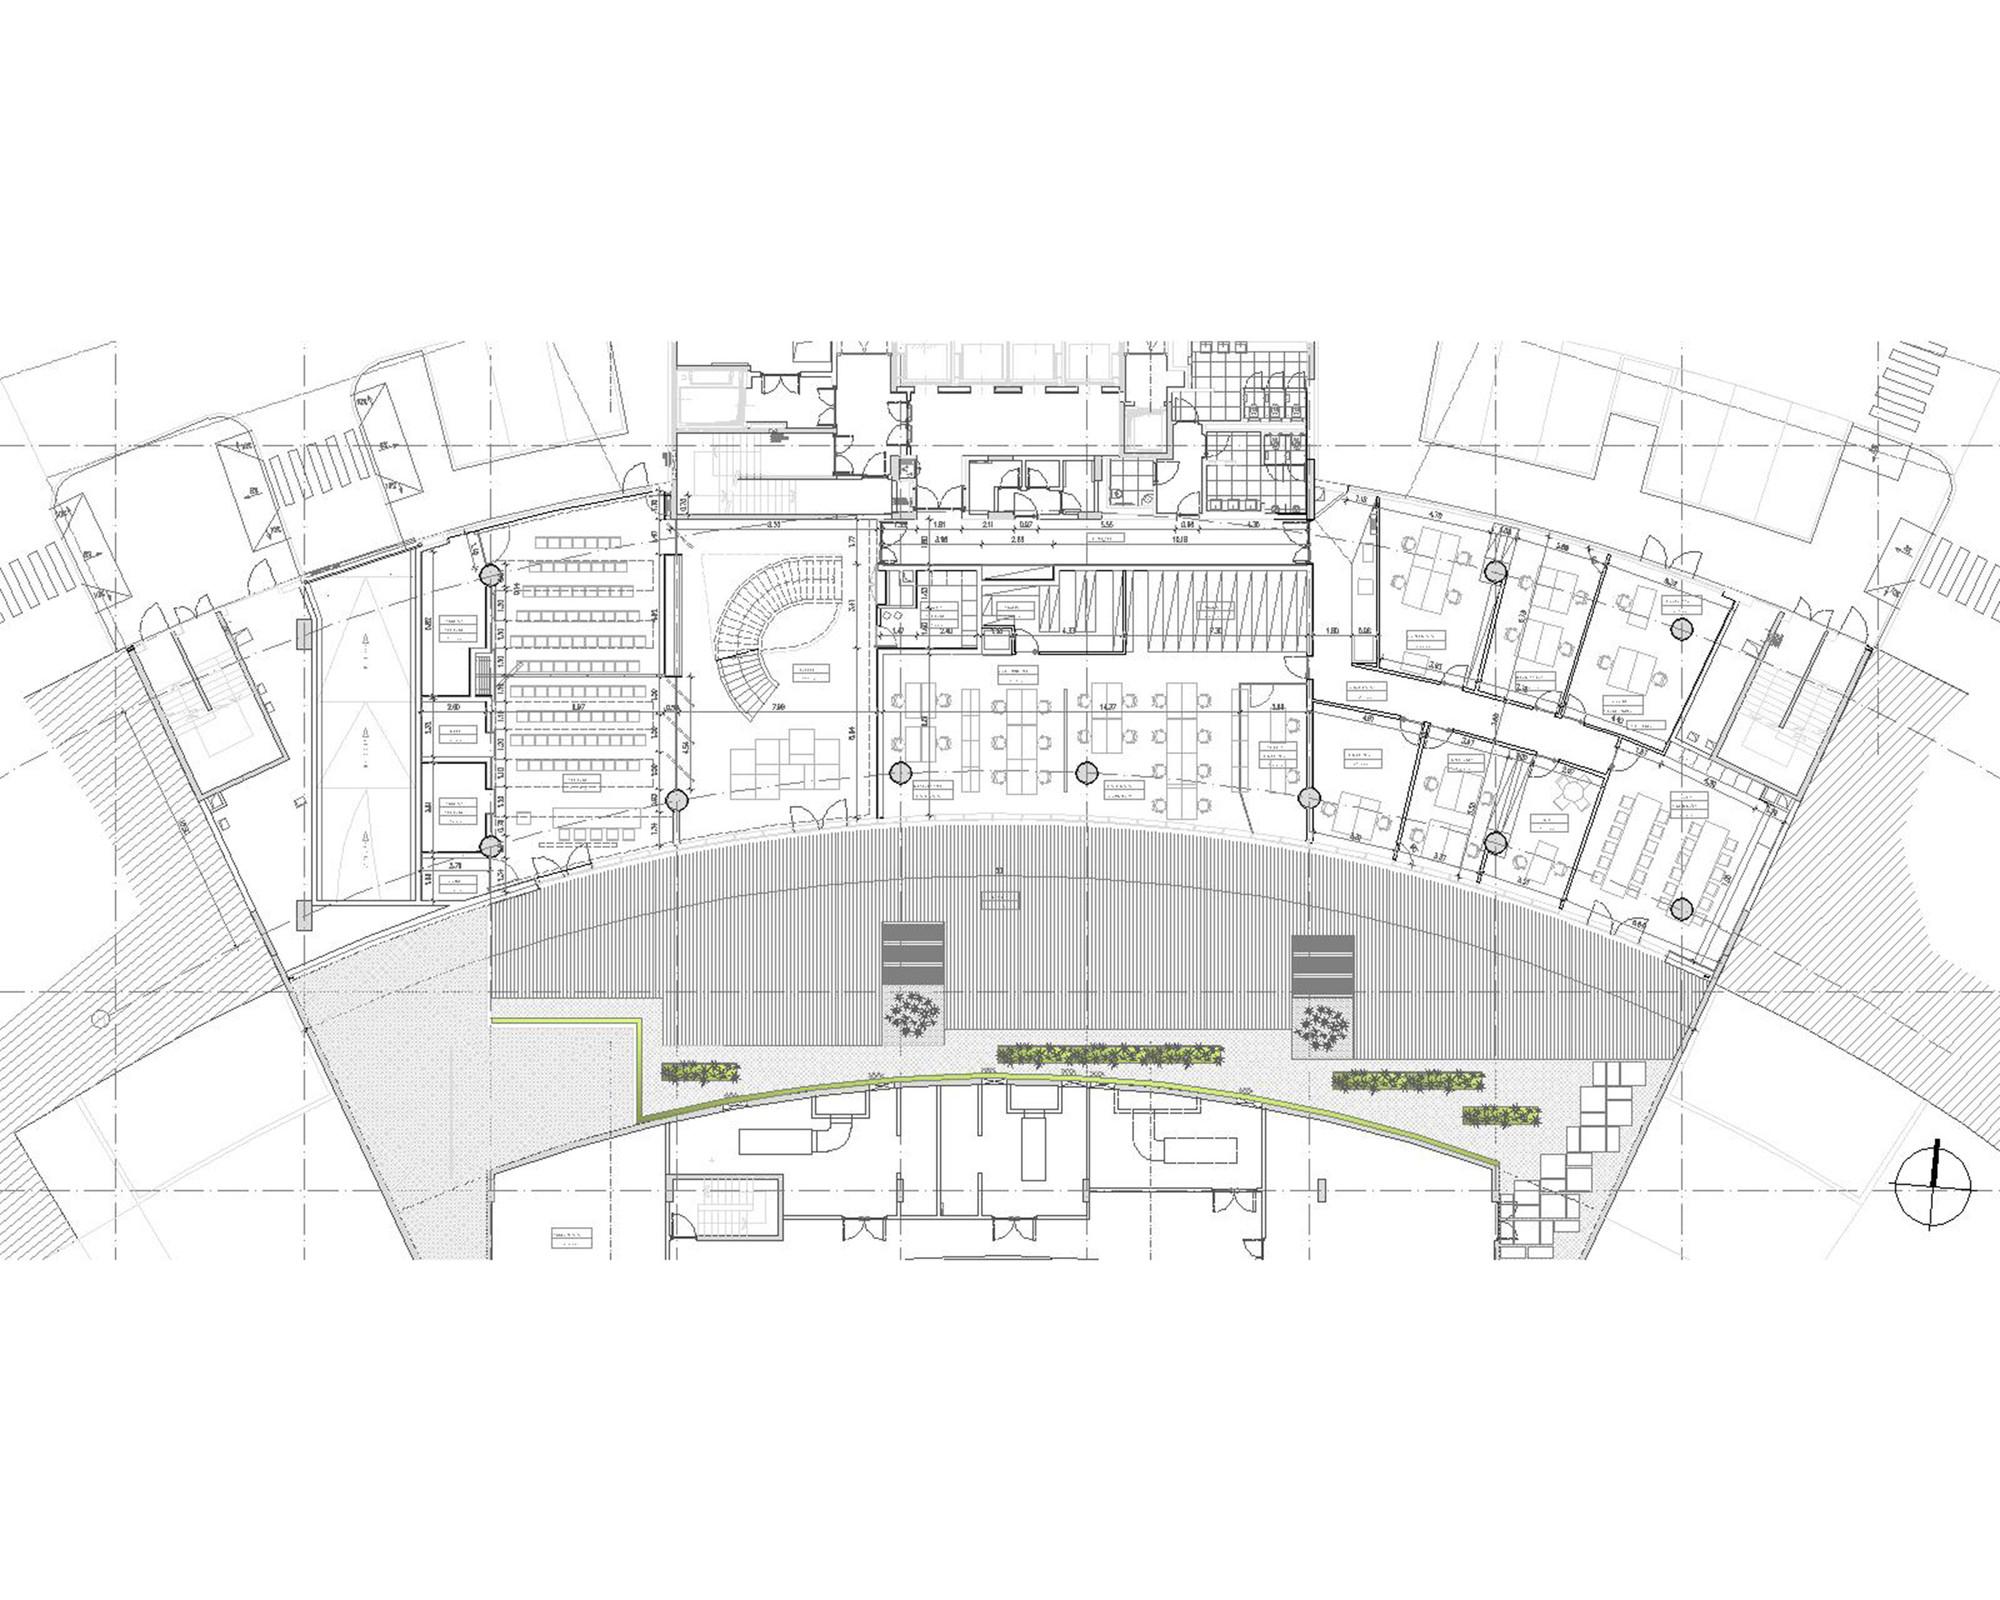 Law Office Floor Plan: Miranda Law Firm / Rita Pinto Ribeiro